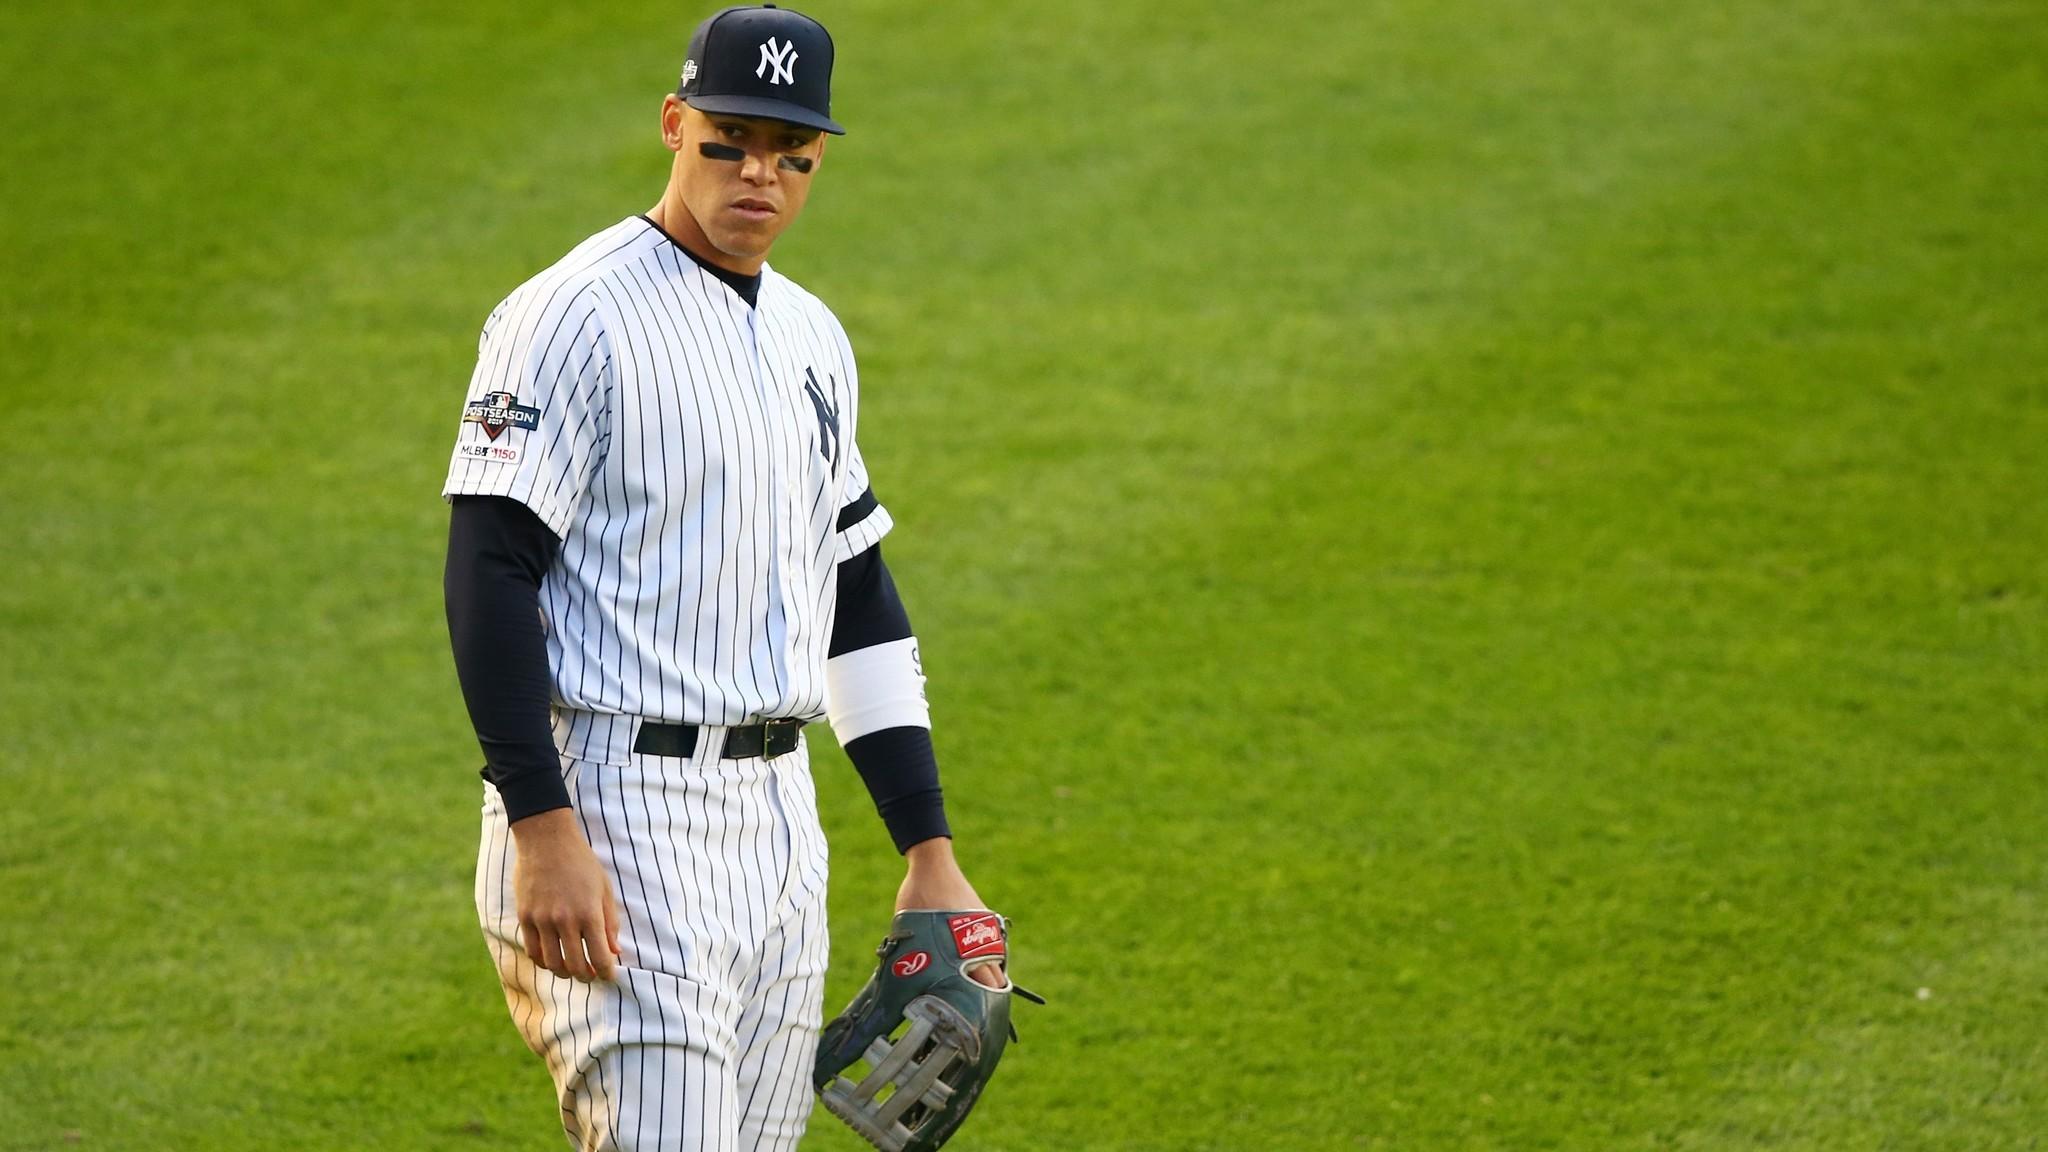 Yankees vs. Astros 2019 ALCS: Breaking down the matchups